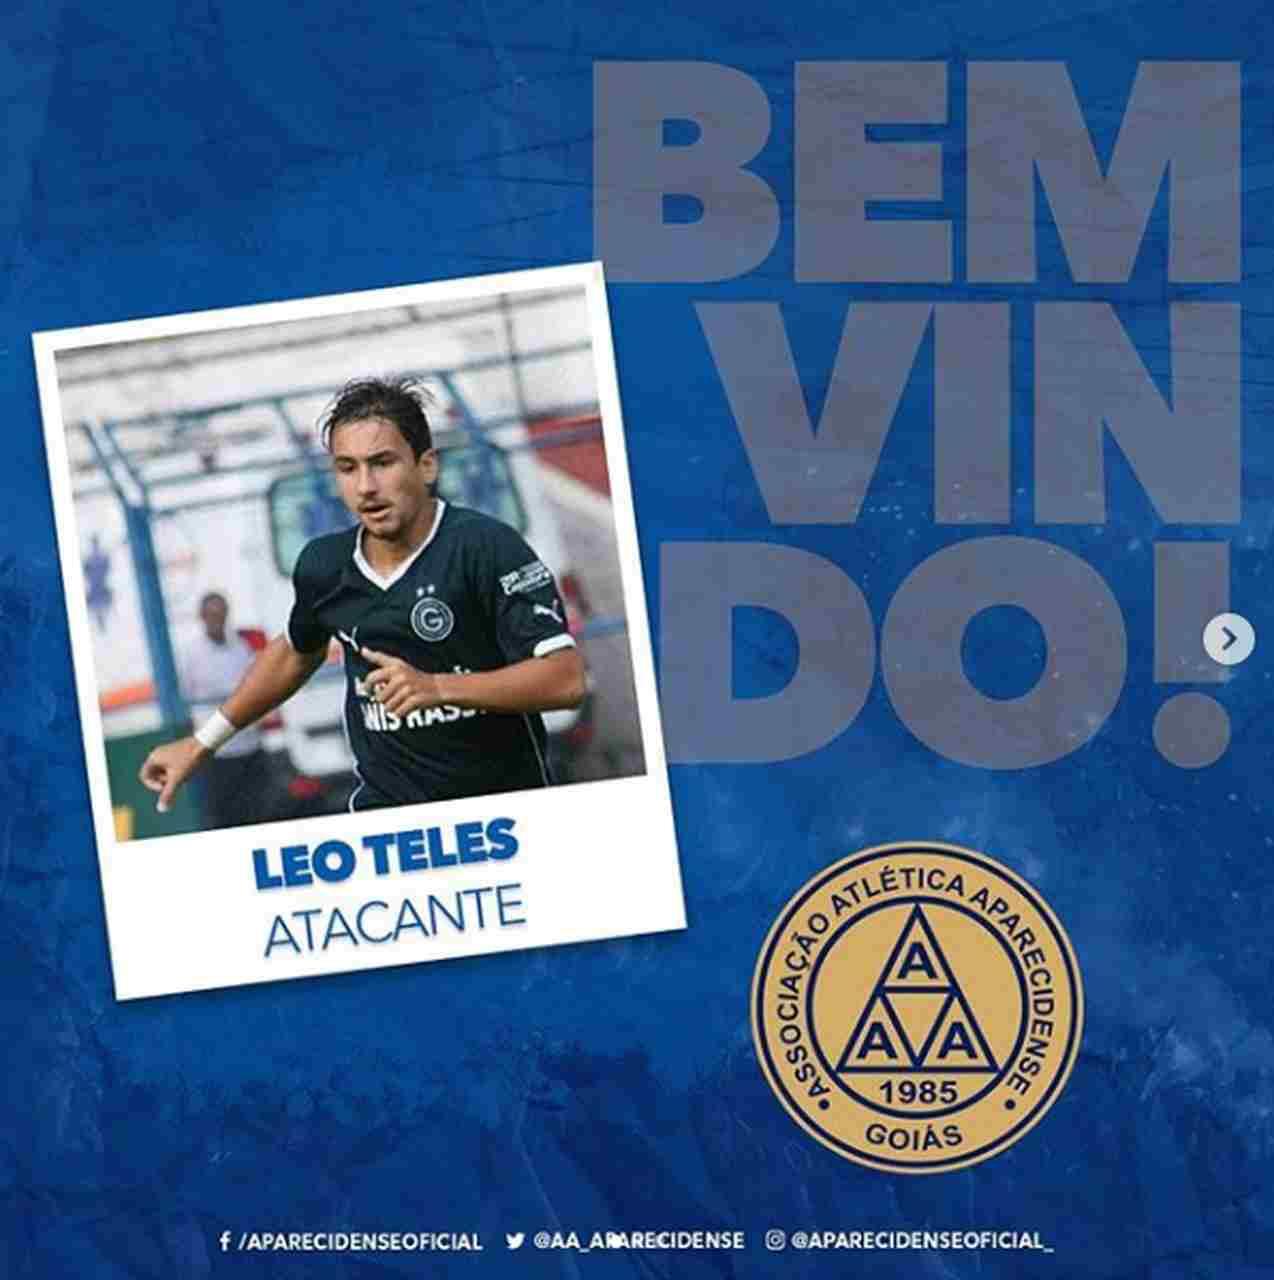 Léo Teles Aparecidense 2020